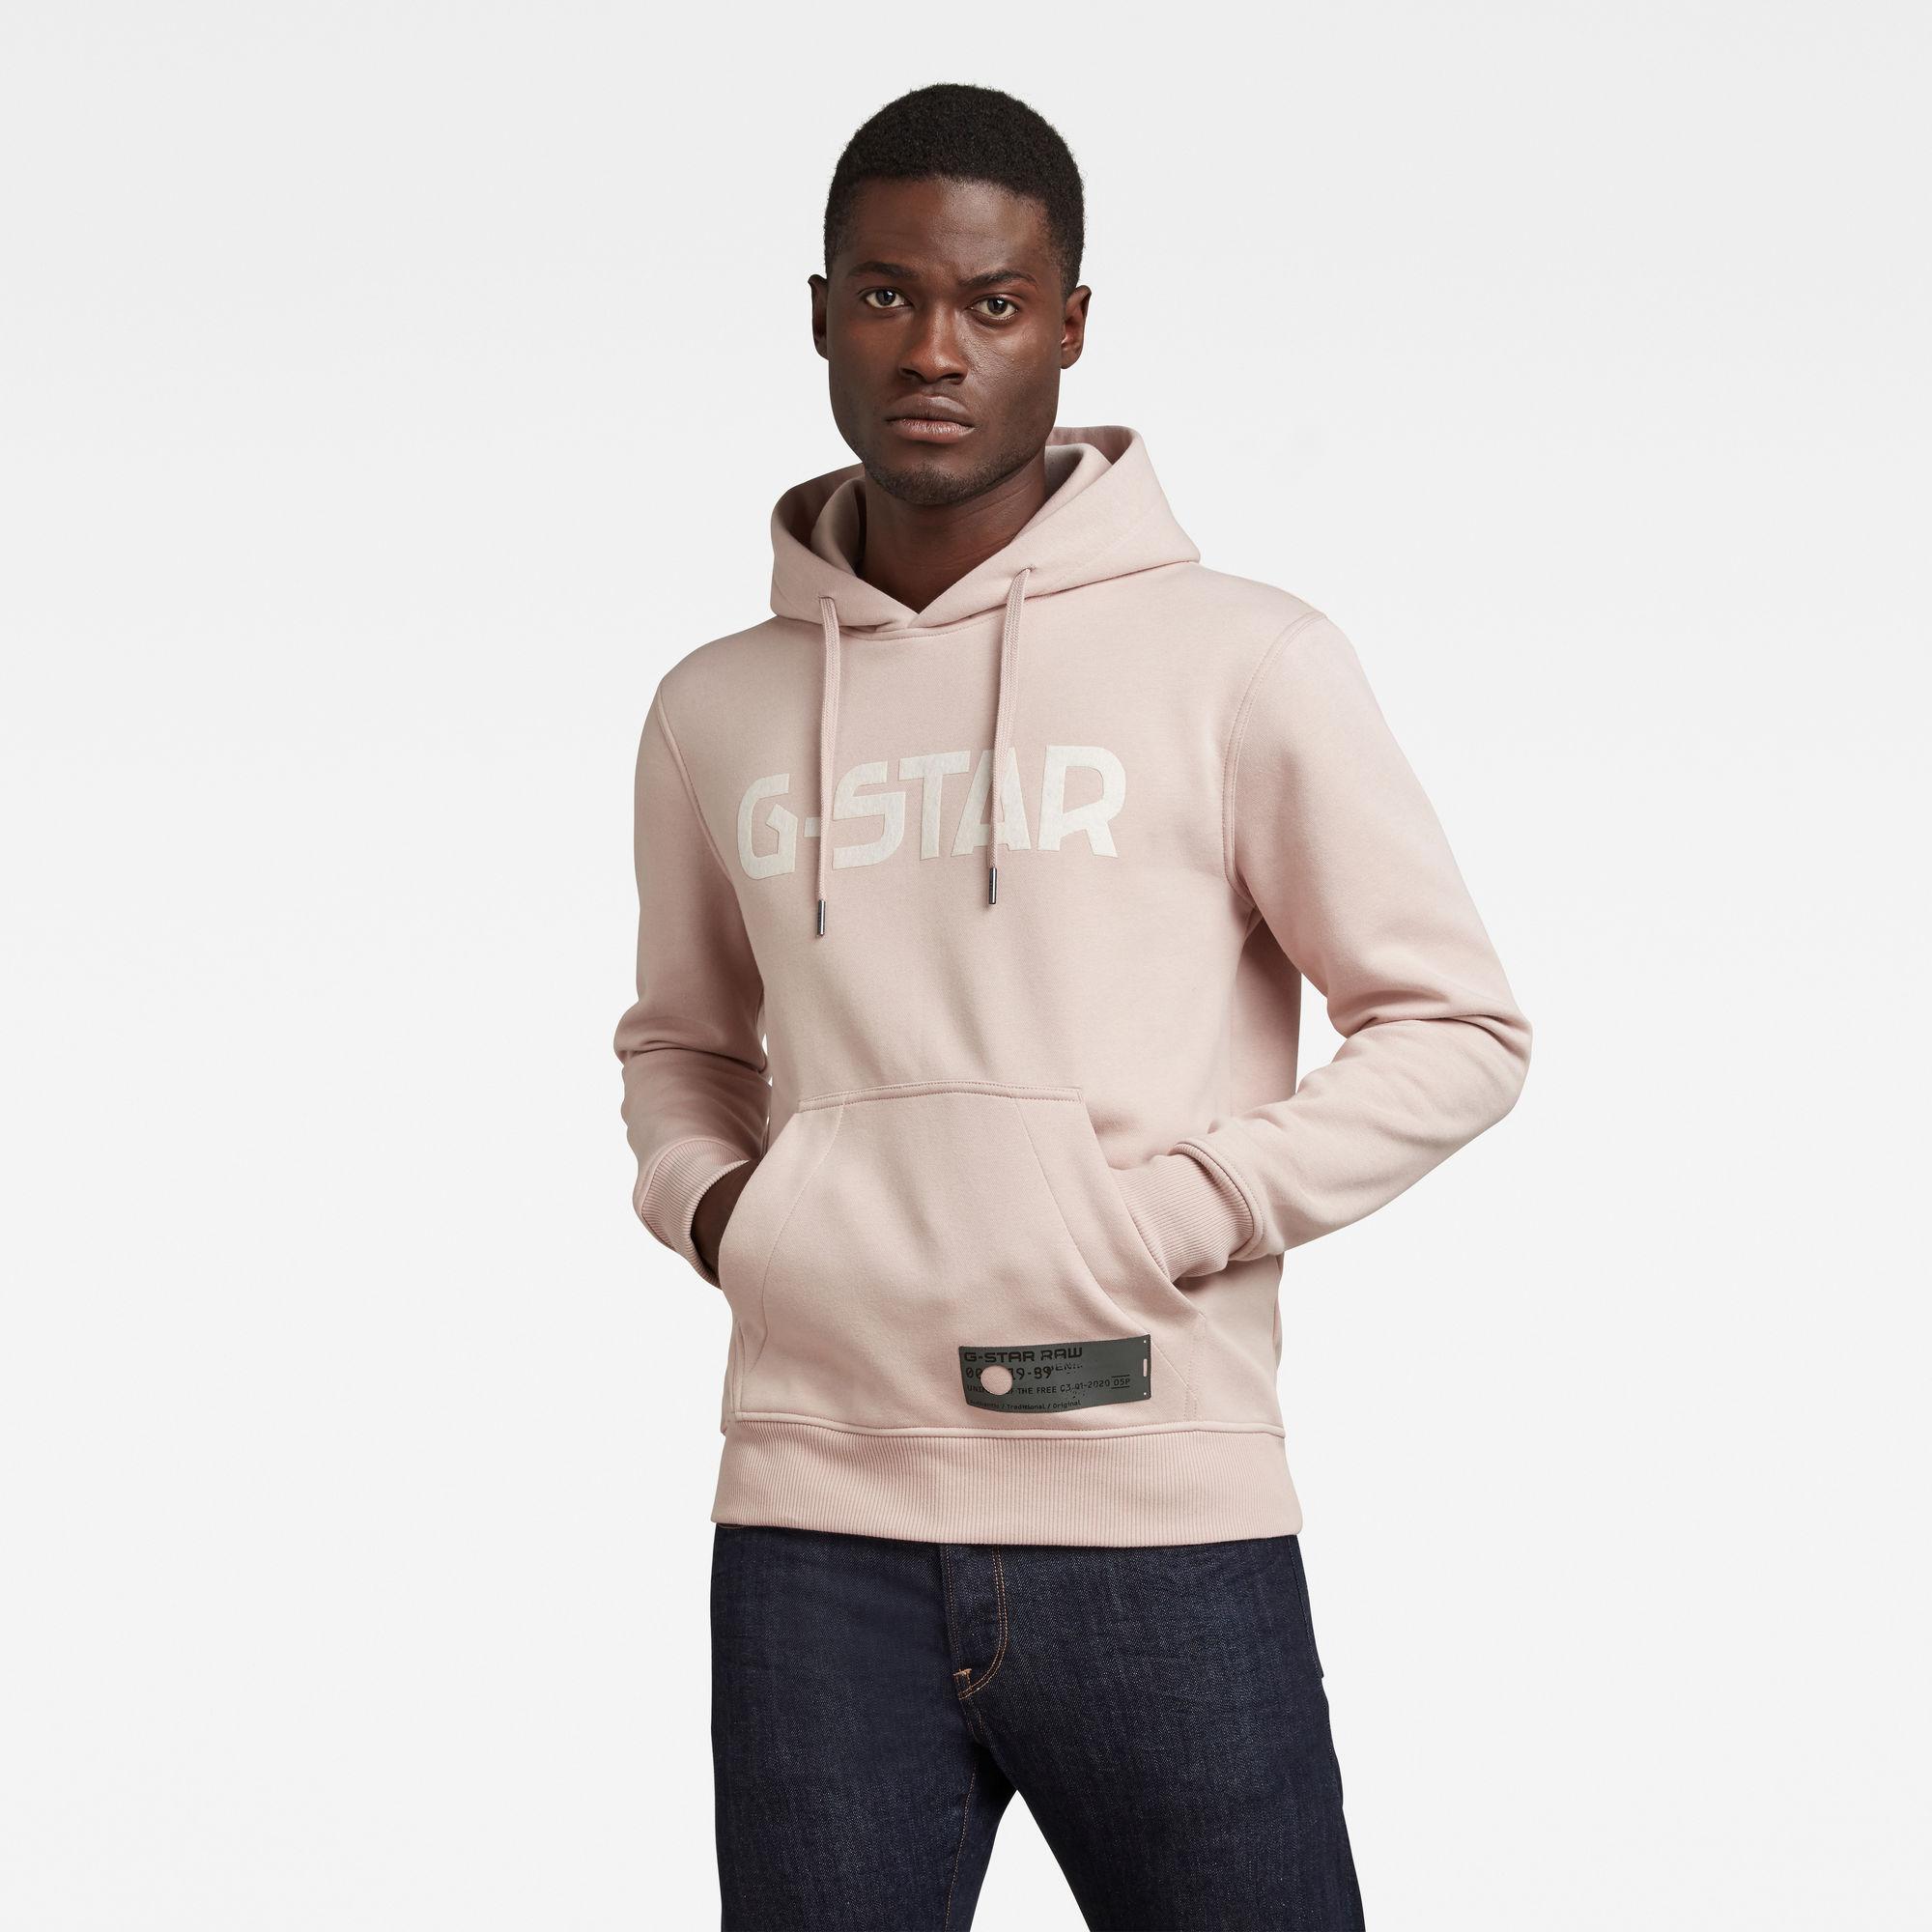 G-Star RAW Heren G-Star Hooded Sweater Roze